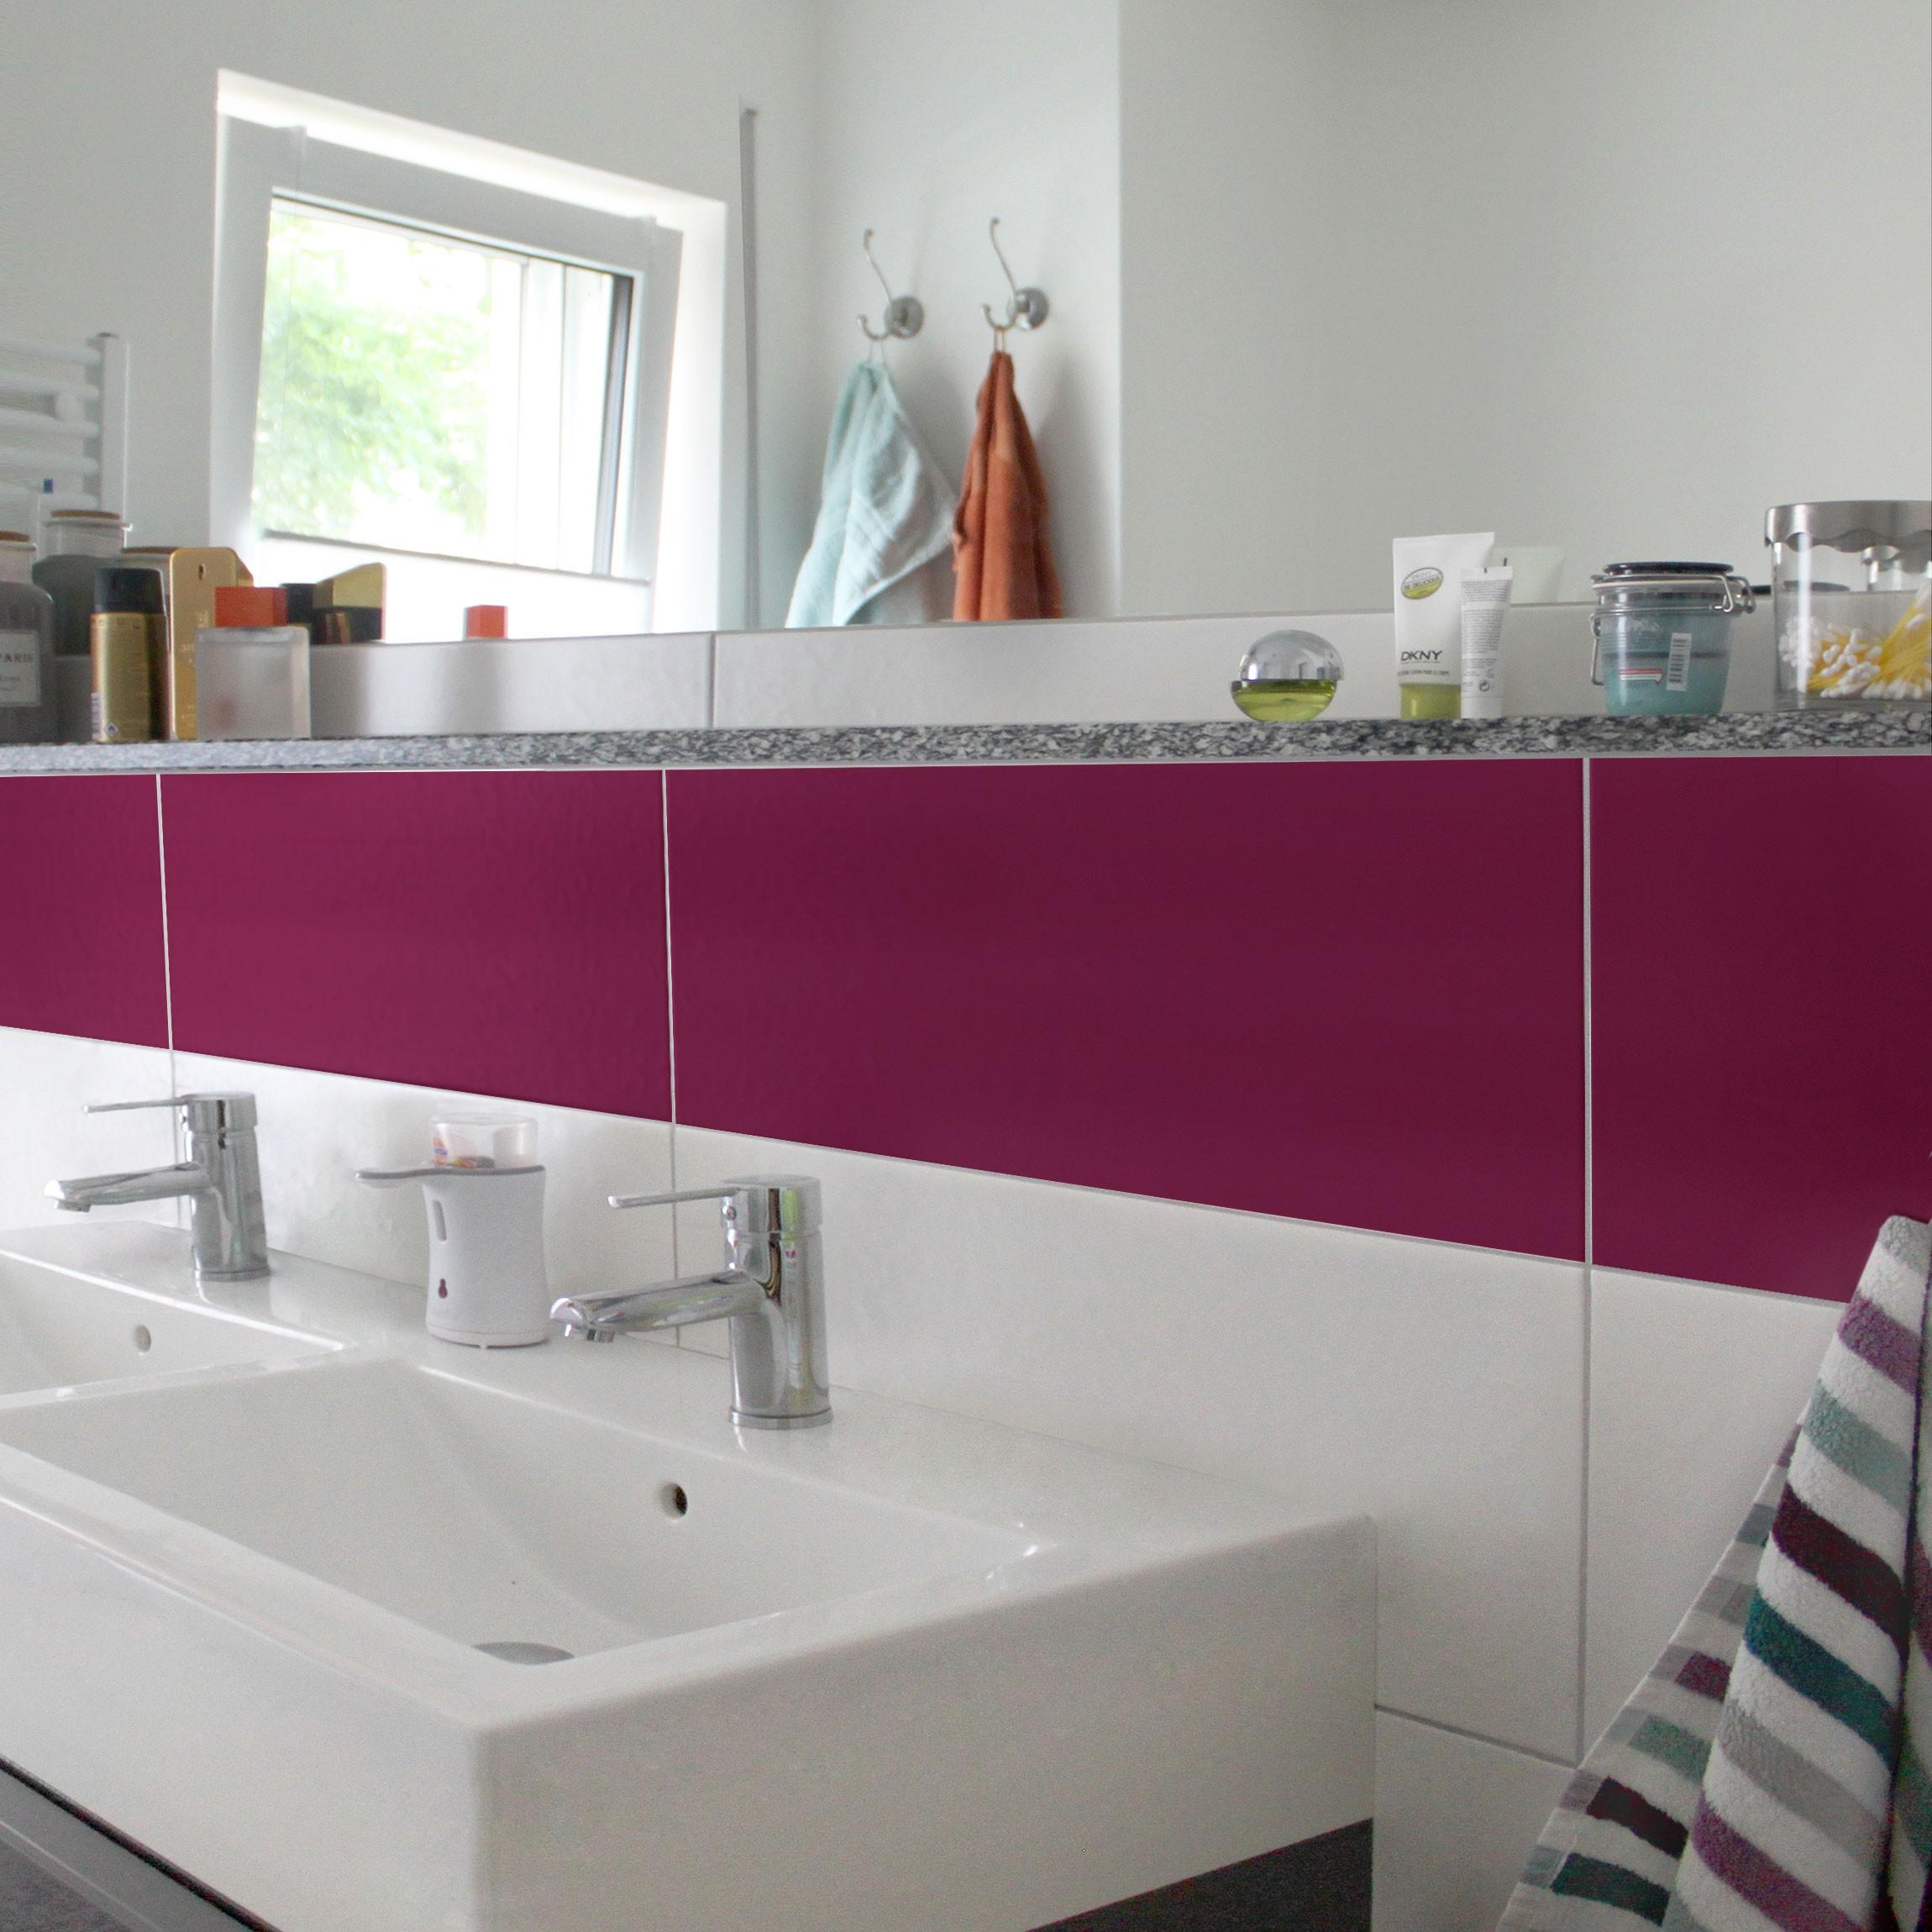 fliesenaufkleber bad k che colour wine red 30x60 cm set. Black Bedroom Furniture Sets. Home Design Ideas